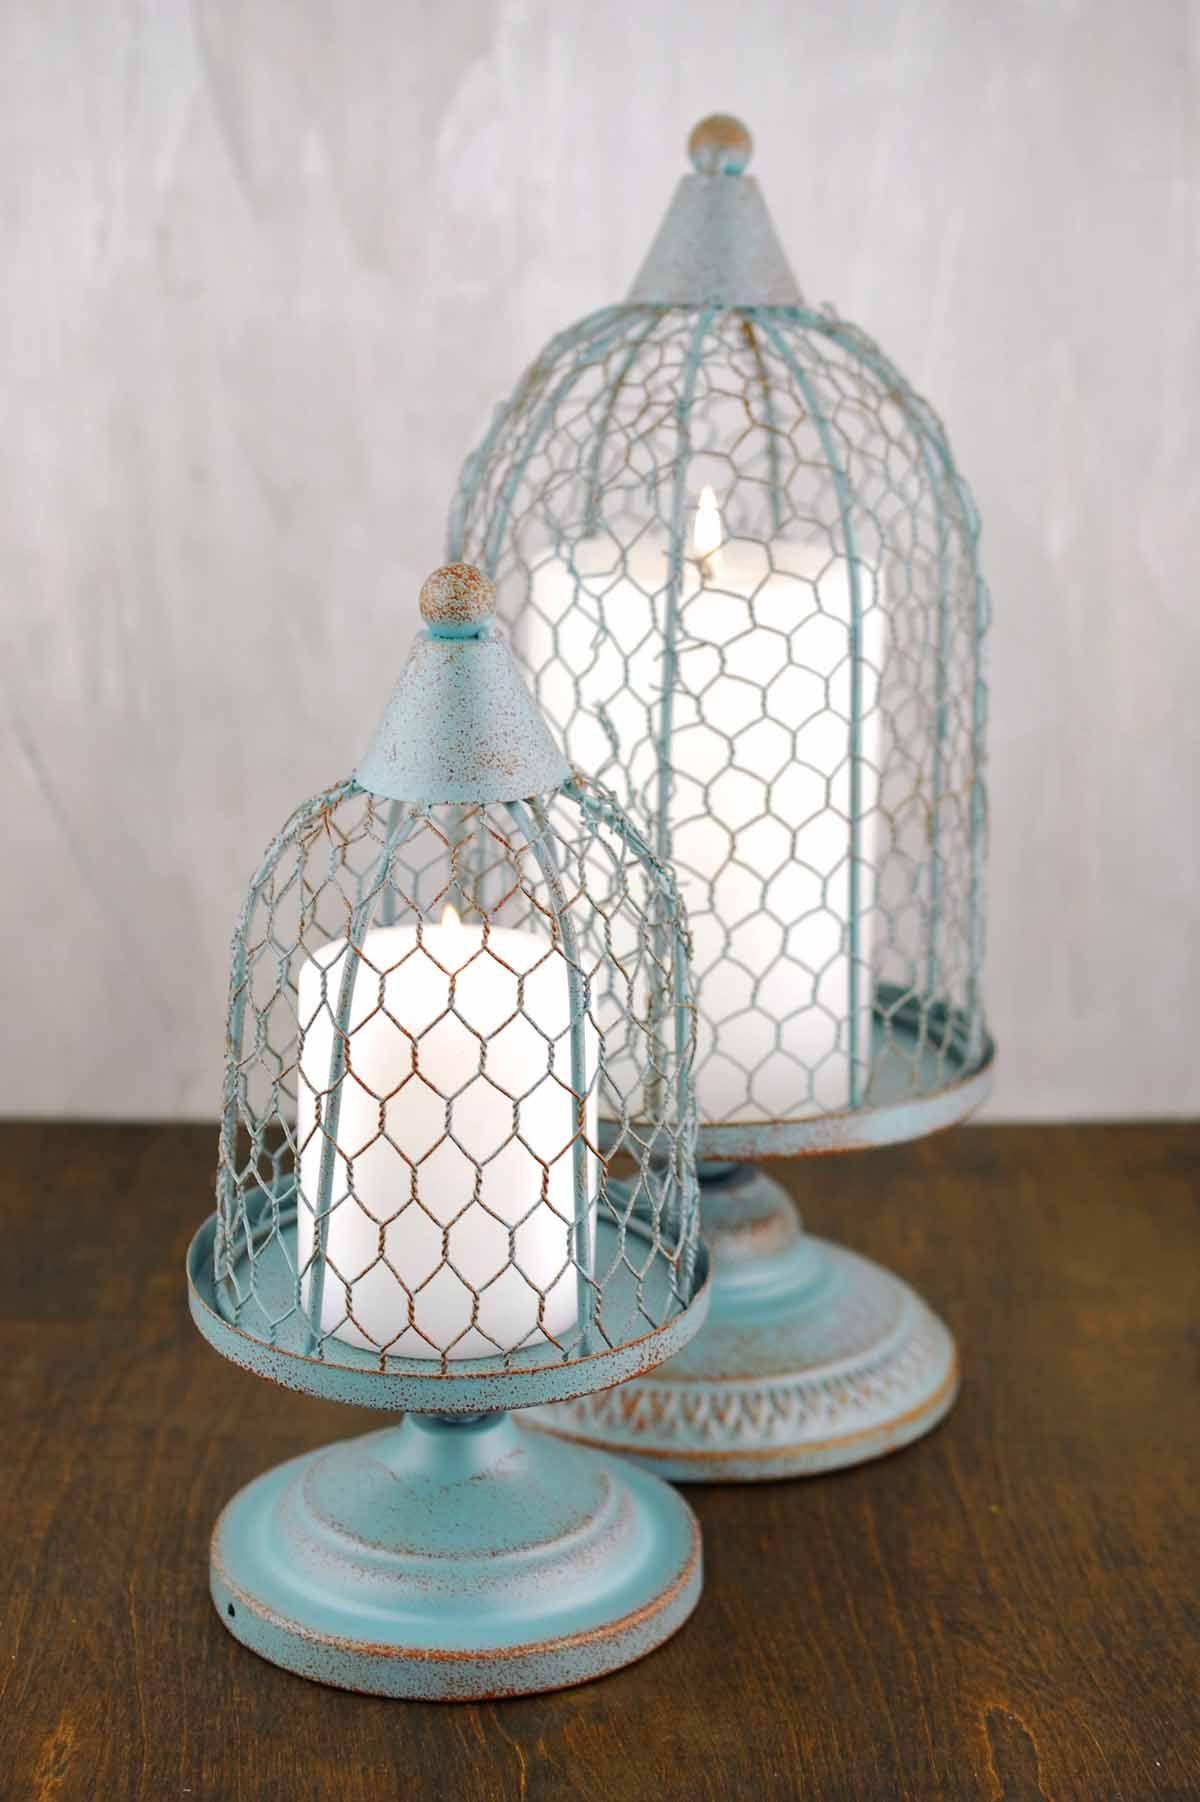 300+ Candle Holders, Candelabra & Candlesticks | Slate, Bird cages ...